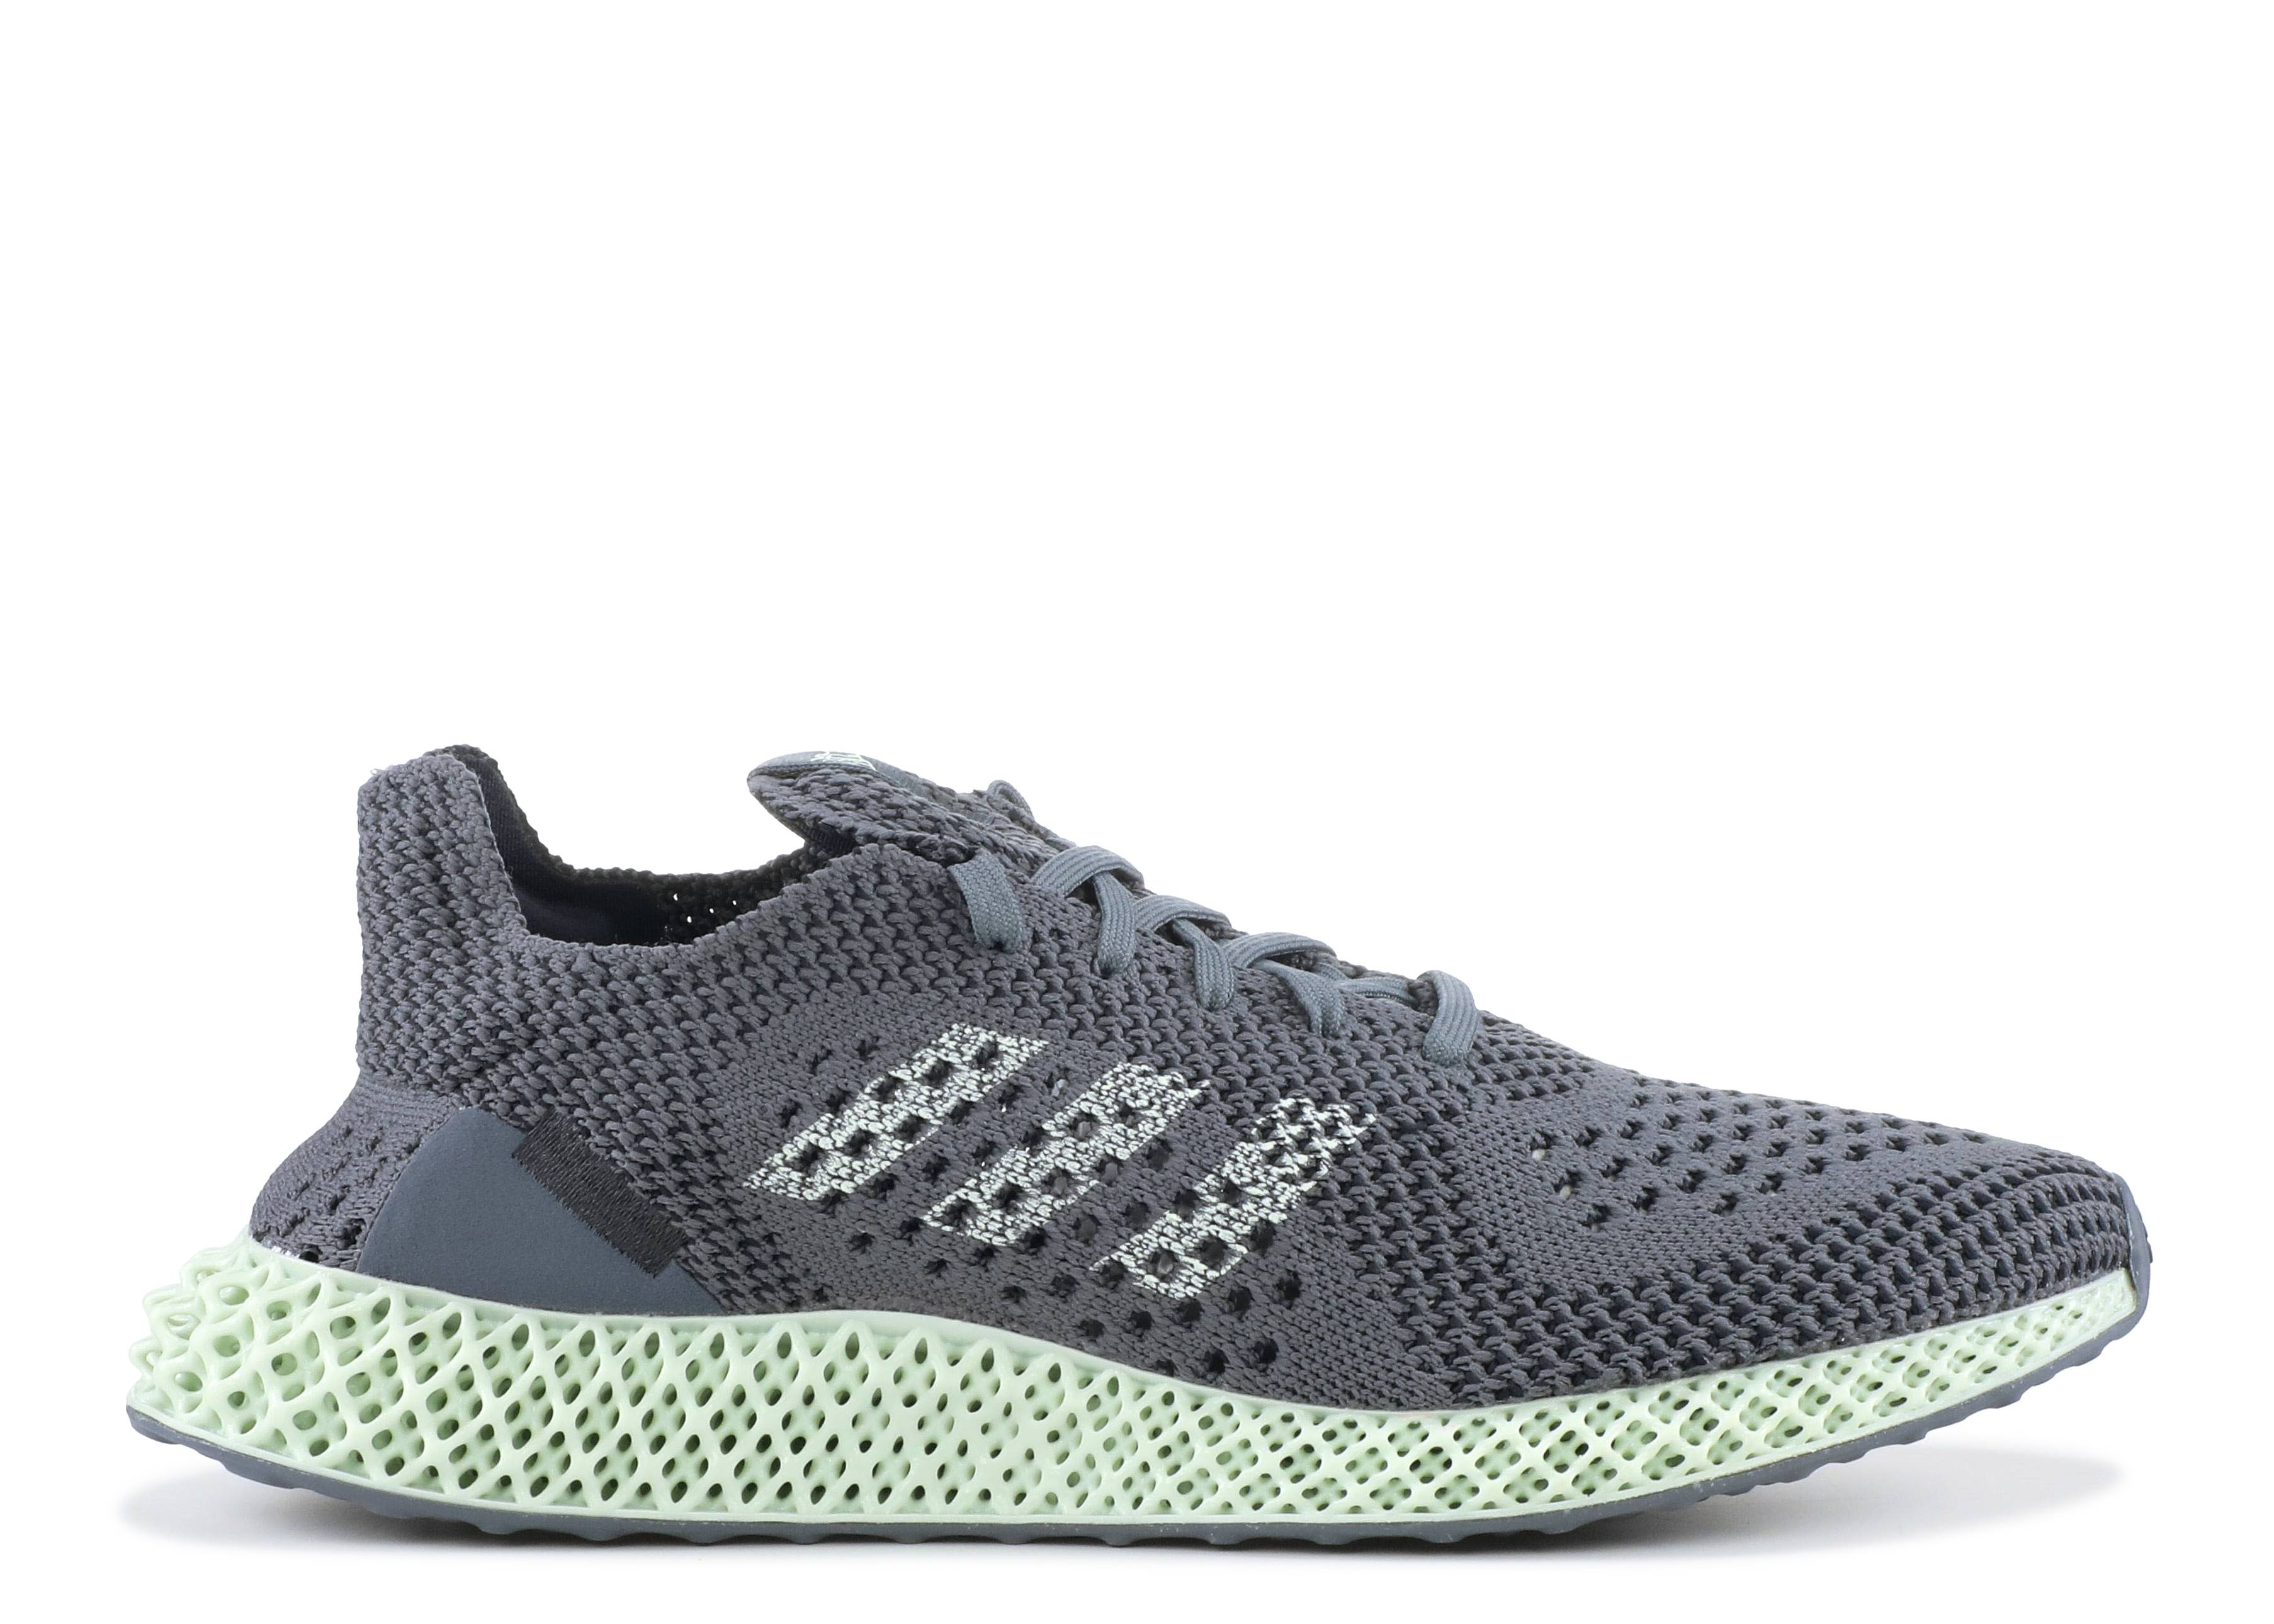 release date 0c6dc bff46 adidas. Futurecraft 4D